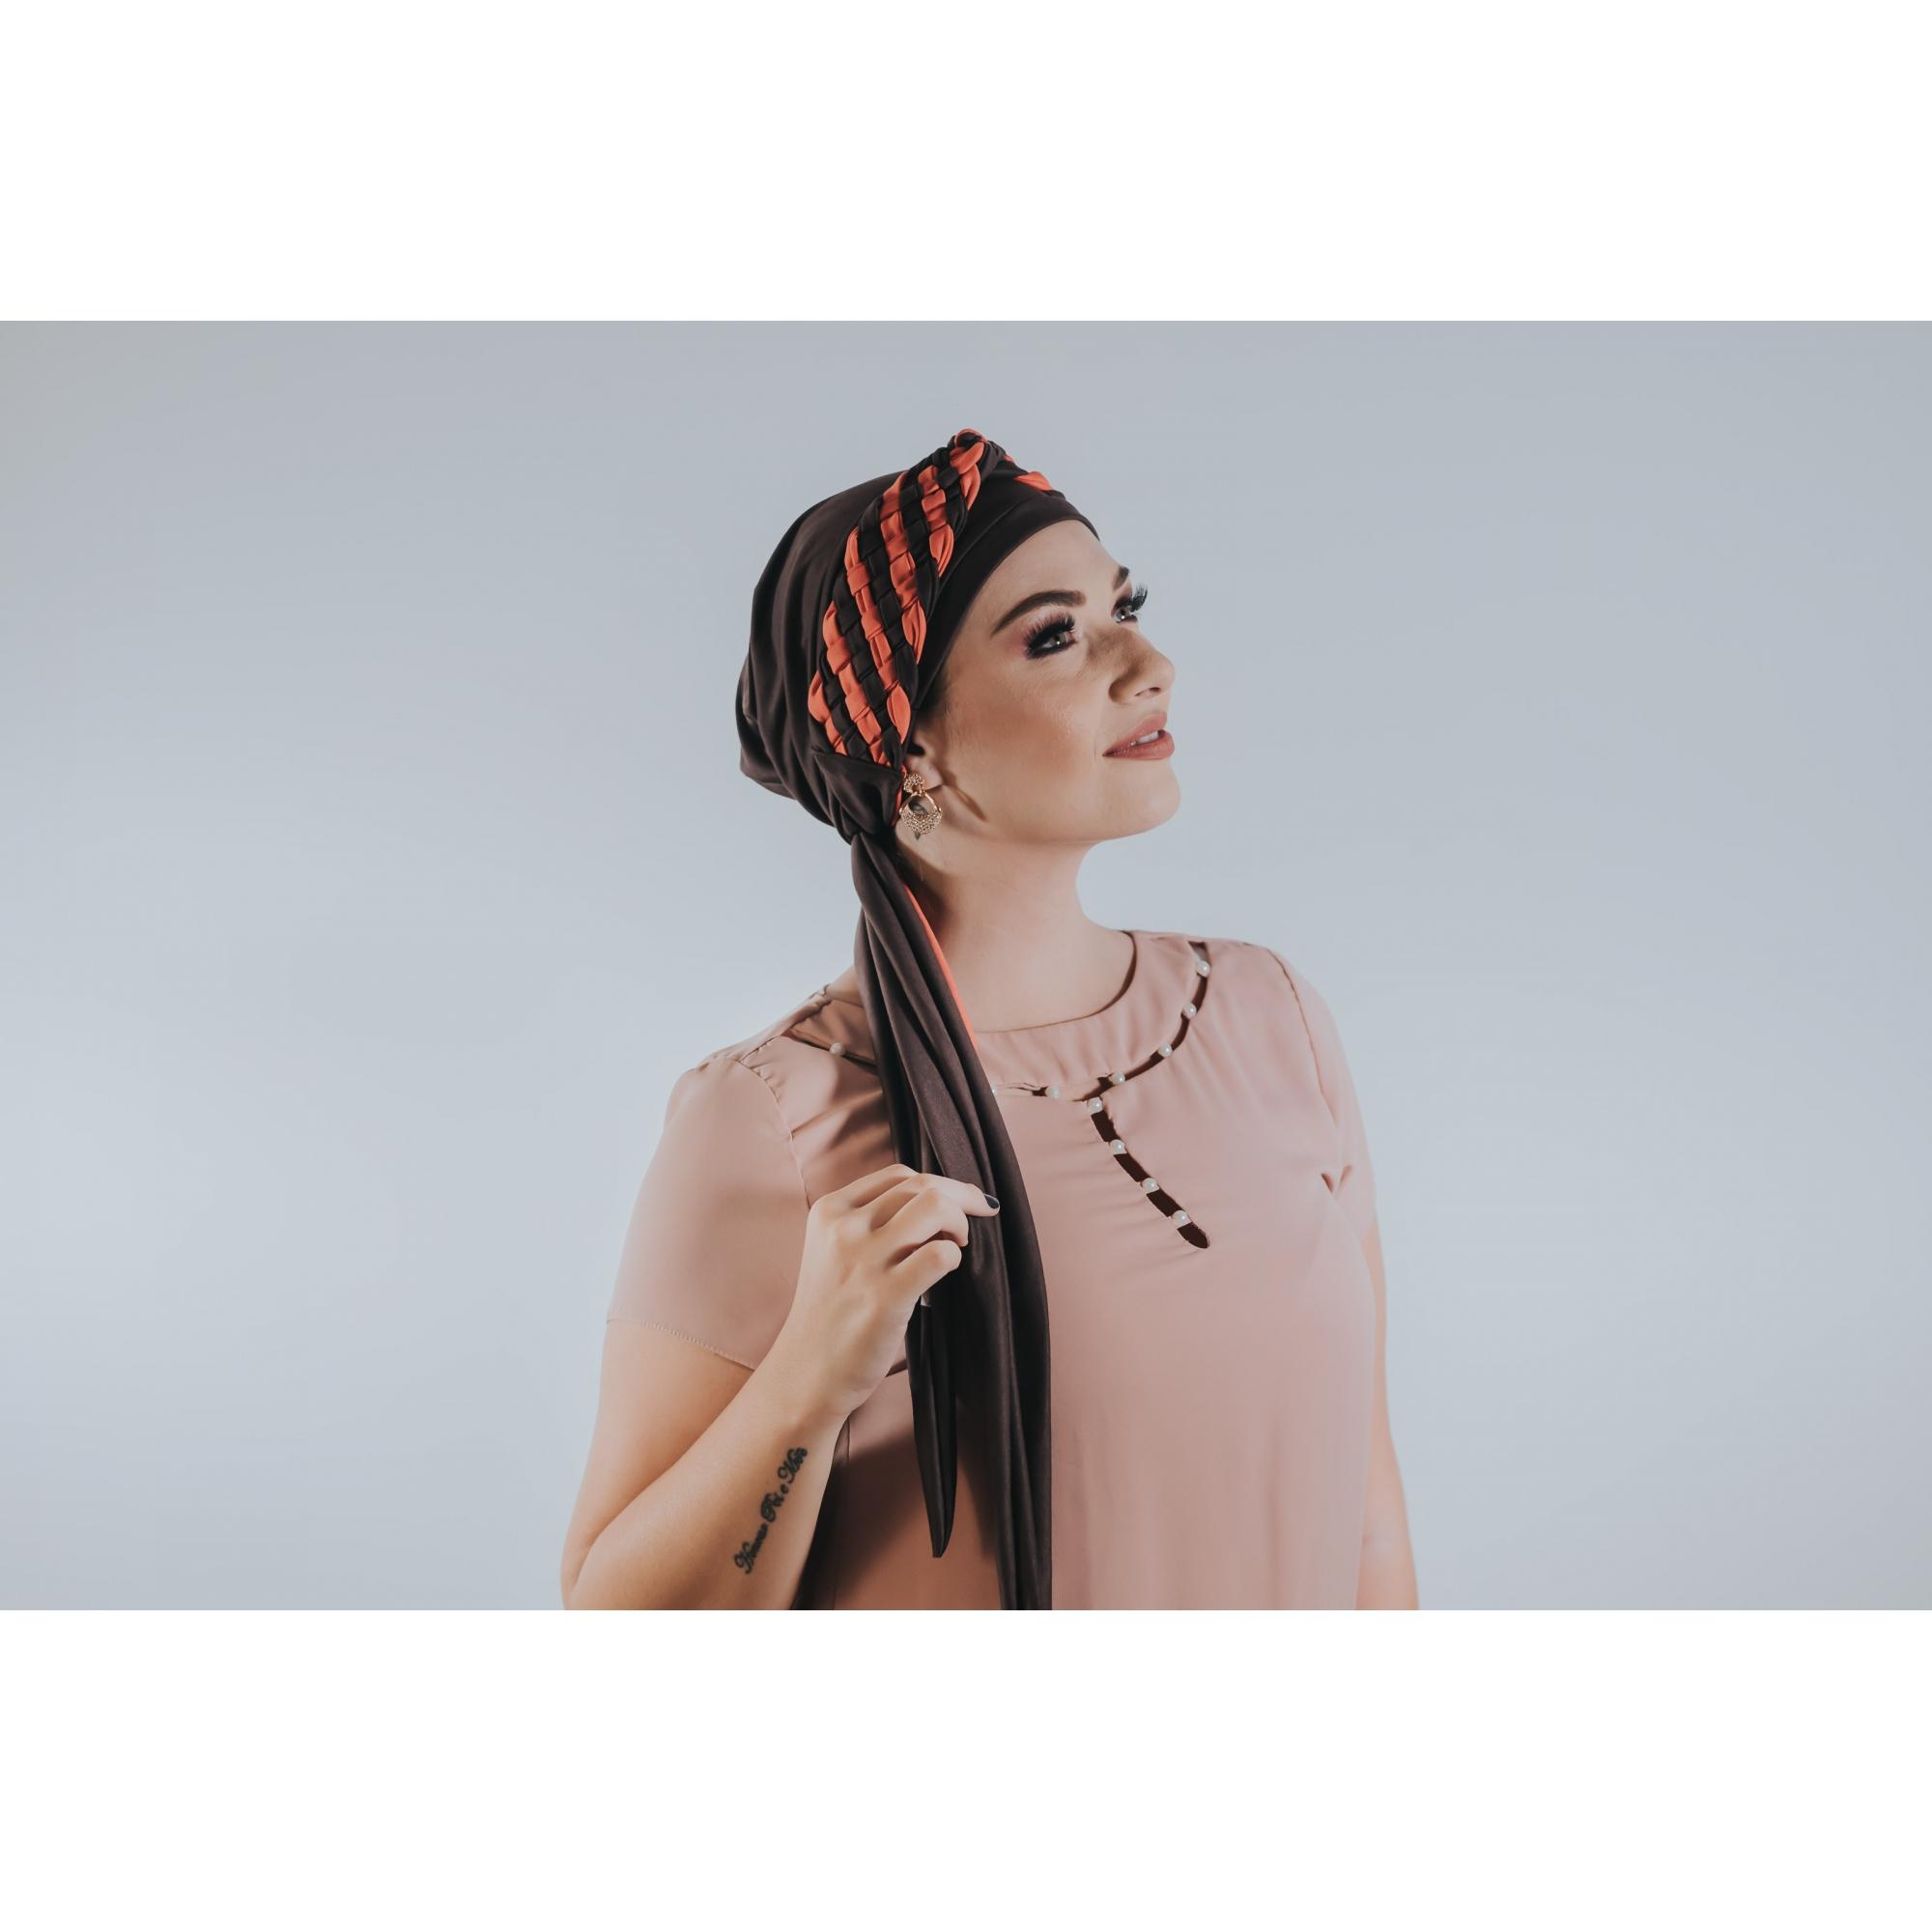 Turbante Marrom + Tiara de trança larga ELOS coral e marrom